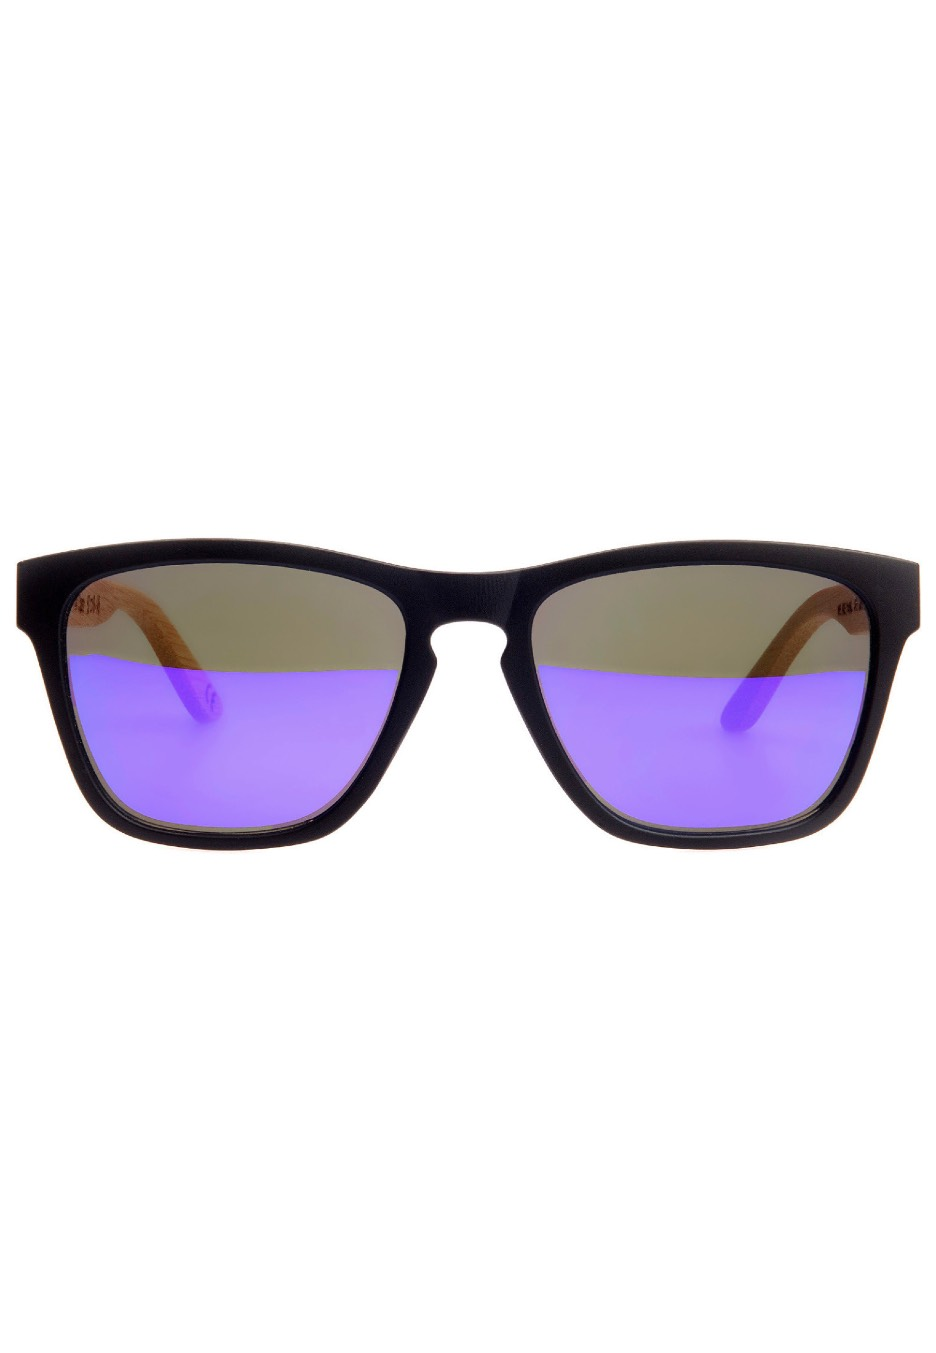 Take A Shot - The Daisy Bambus - Sunglasses - Streetwear Shop ... 8c4a2c4e5755e